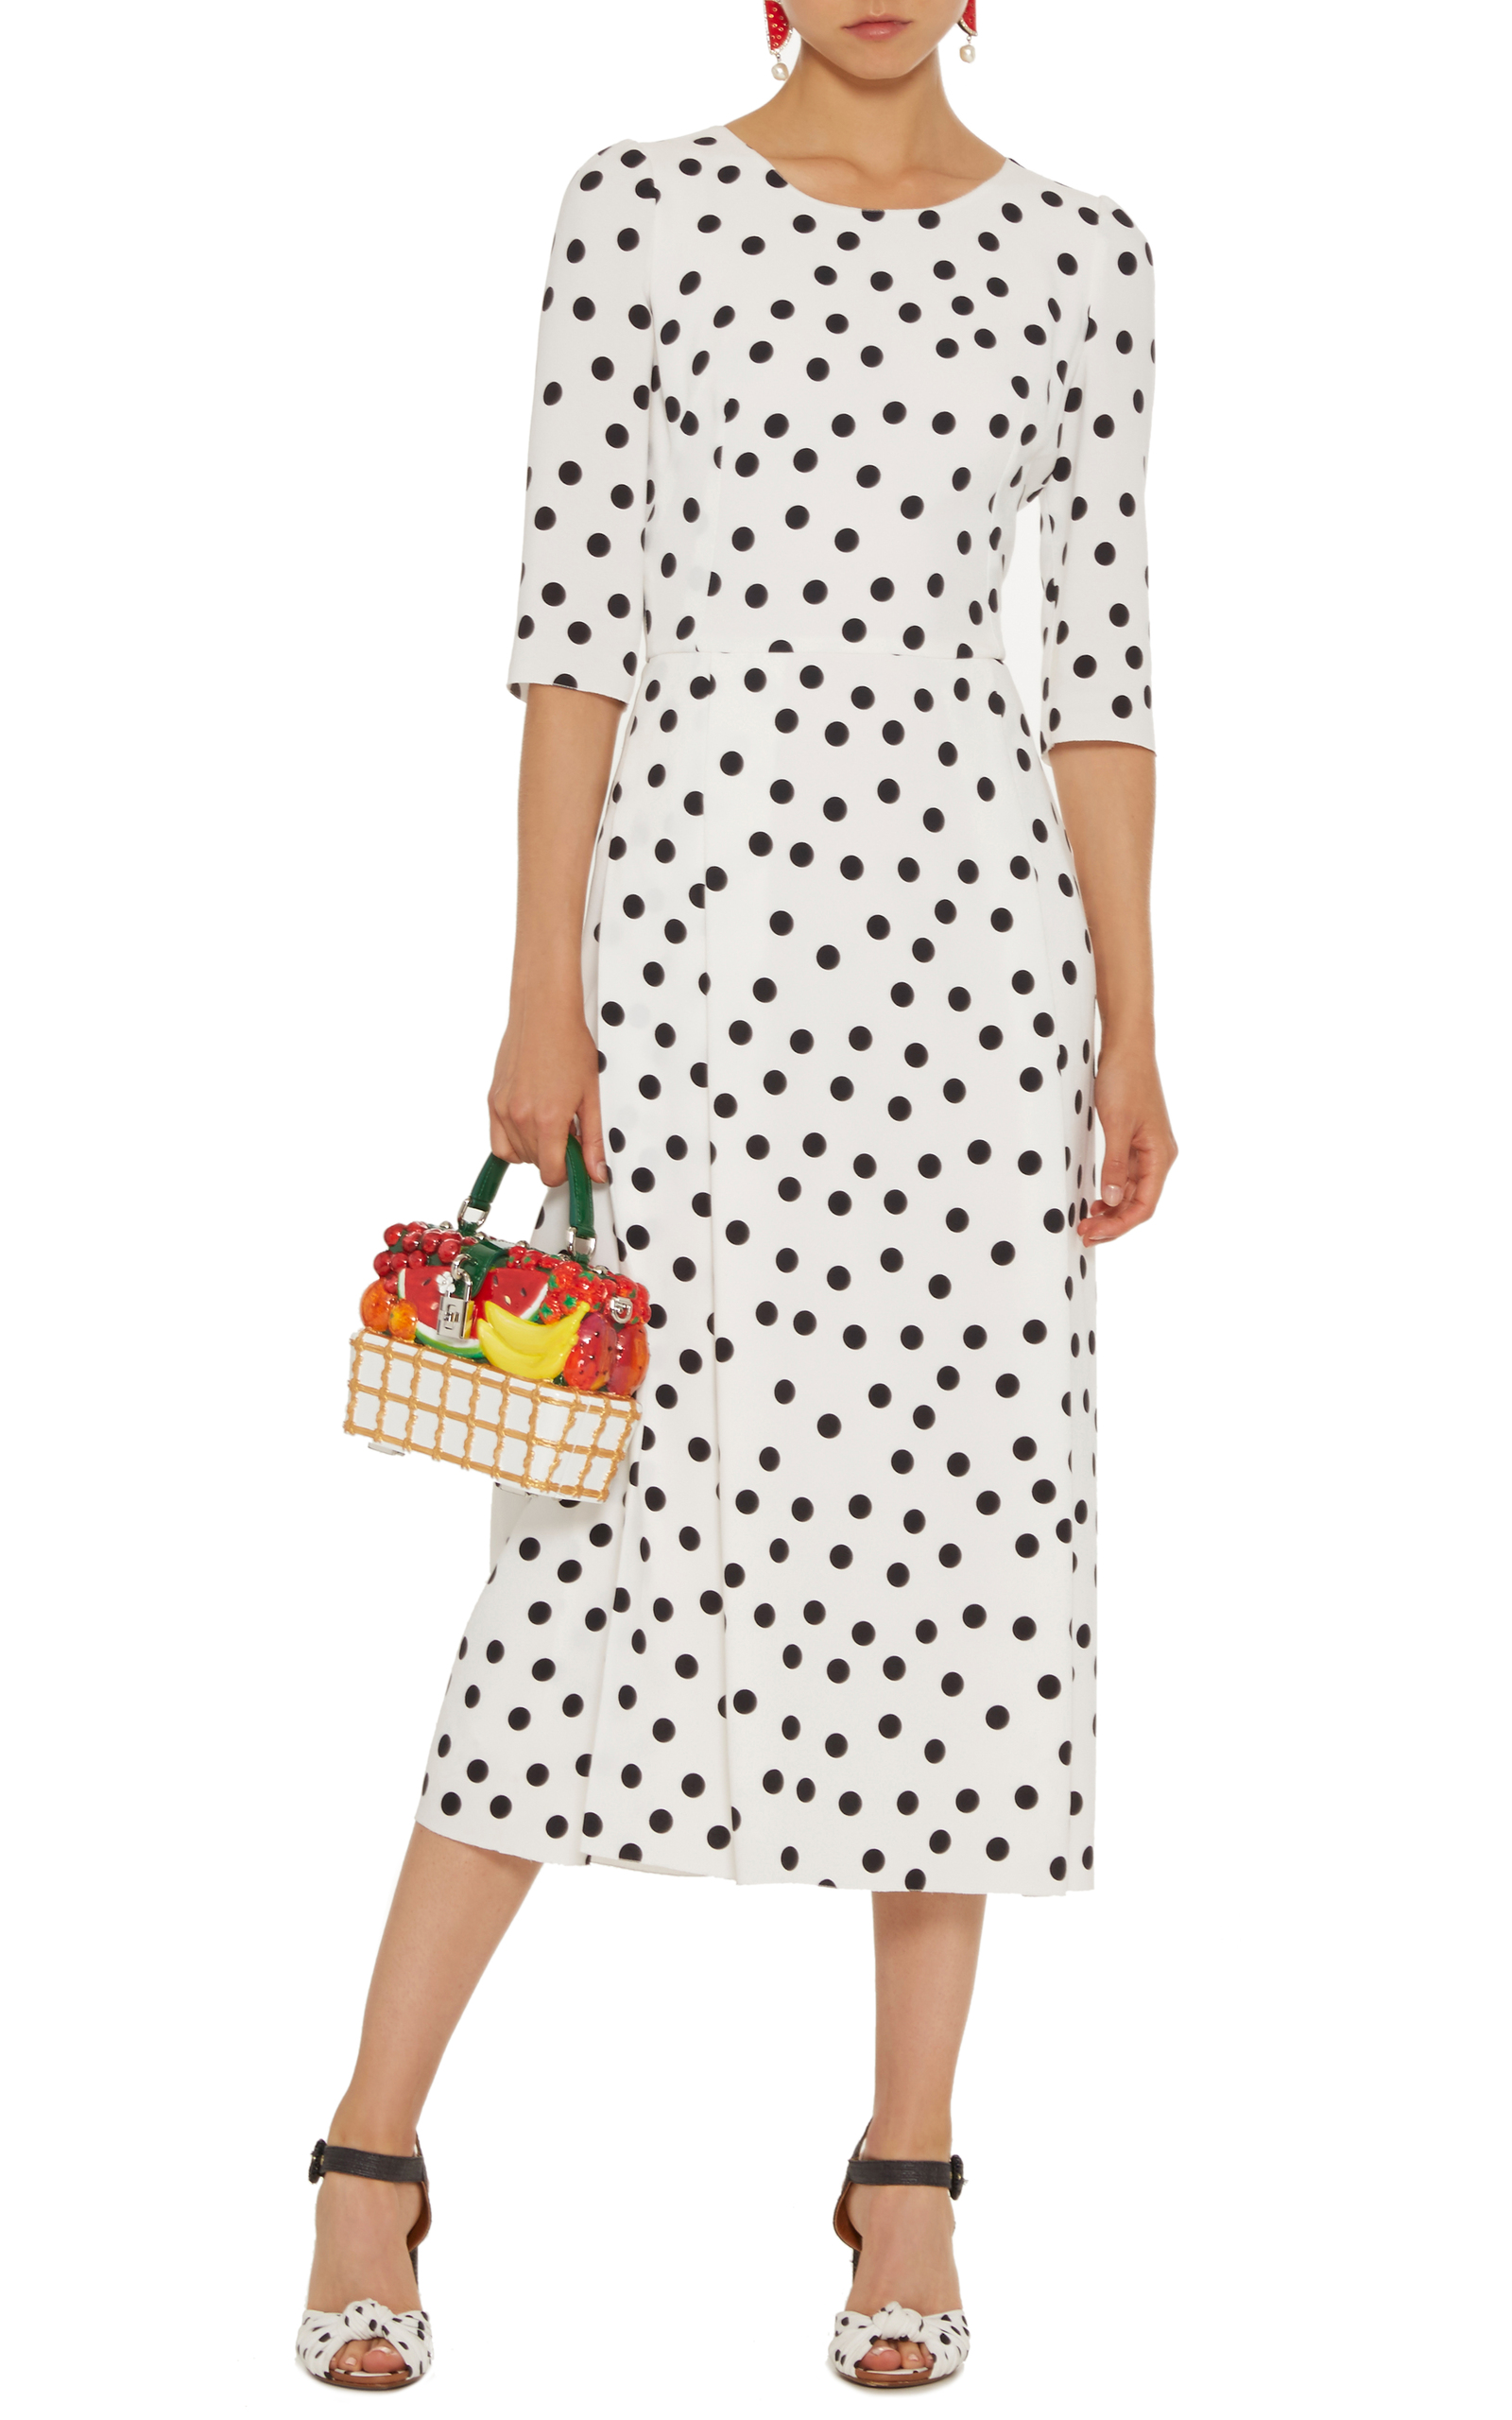 PolkaDot Midi Dress by Dolce  Gabbana  Moda Operandi